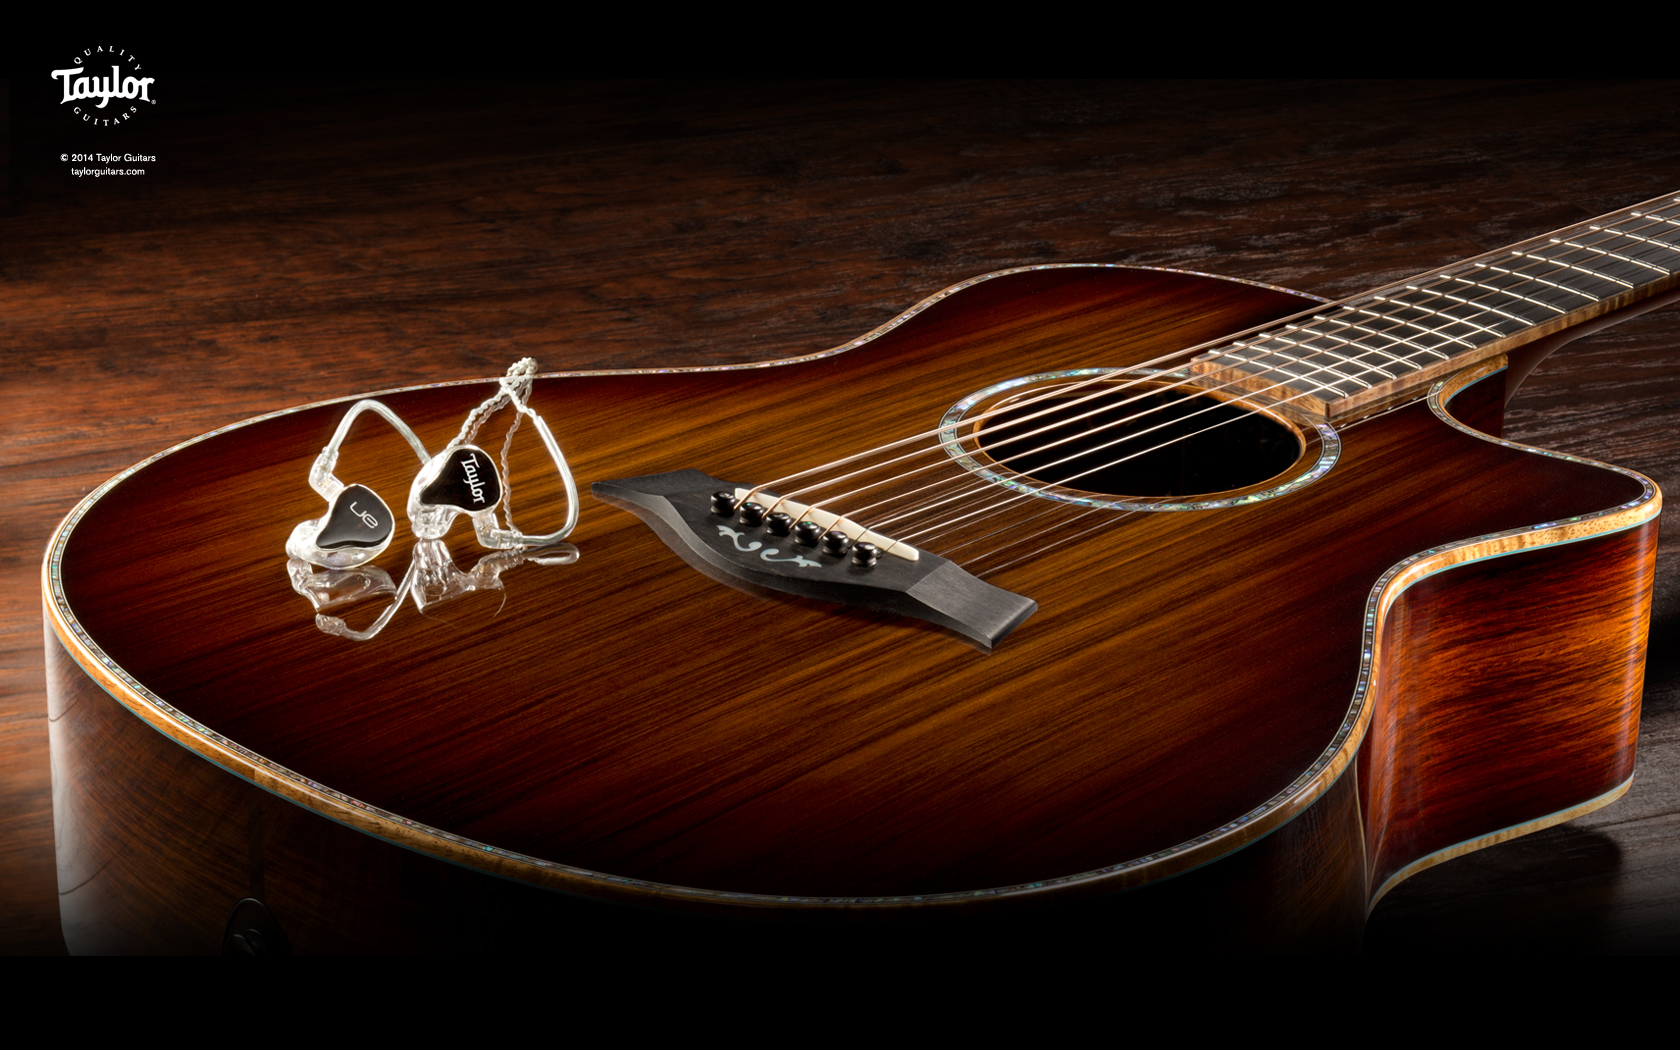 [78+] Taylor Guitar Wallpaper on WallpaperSafariTaylor Swift Acoustic Guitar Wallpaper